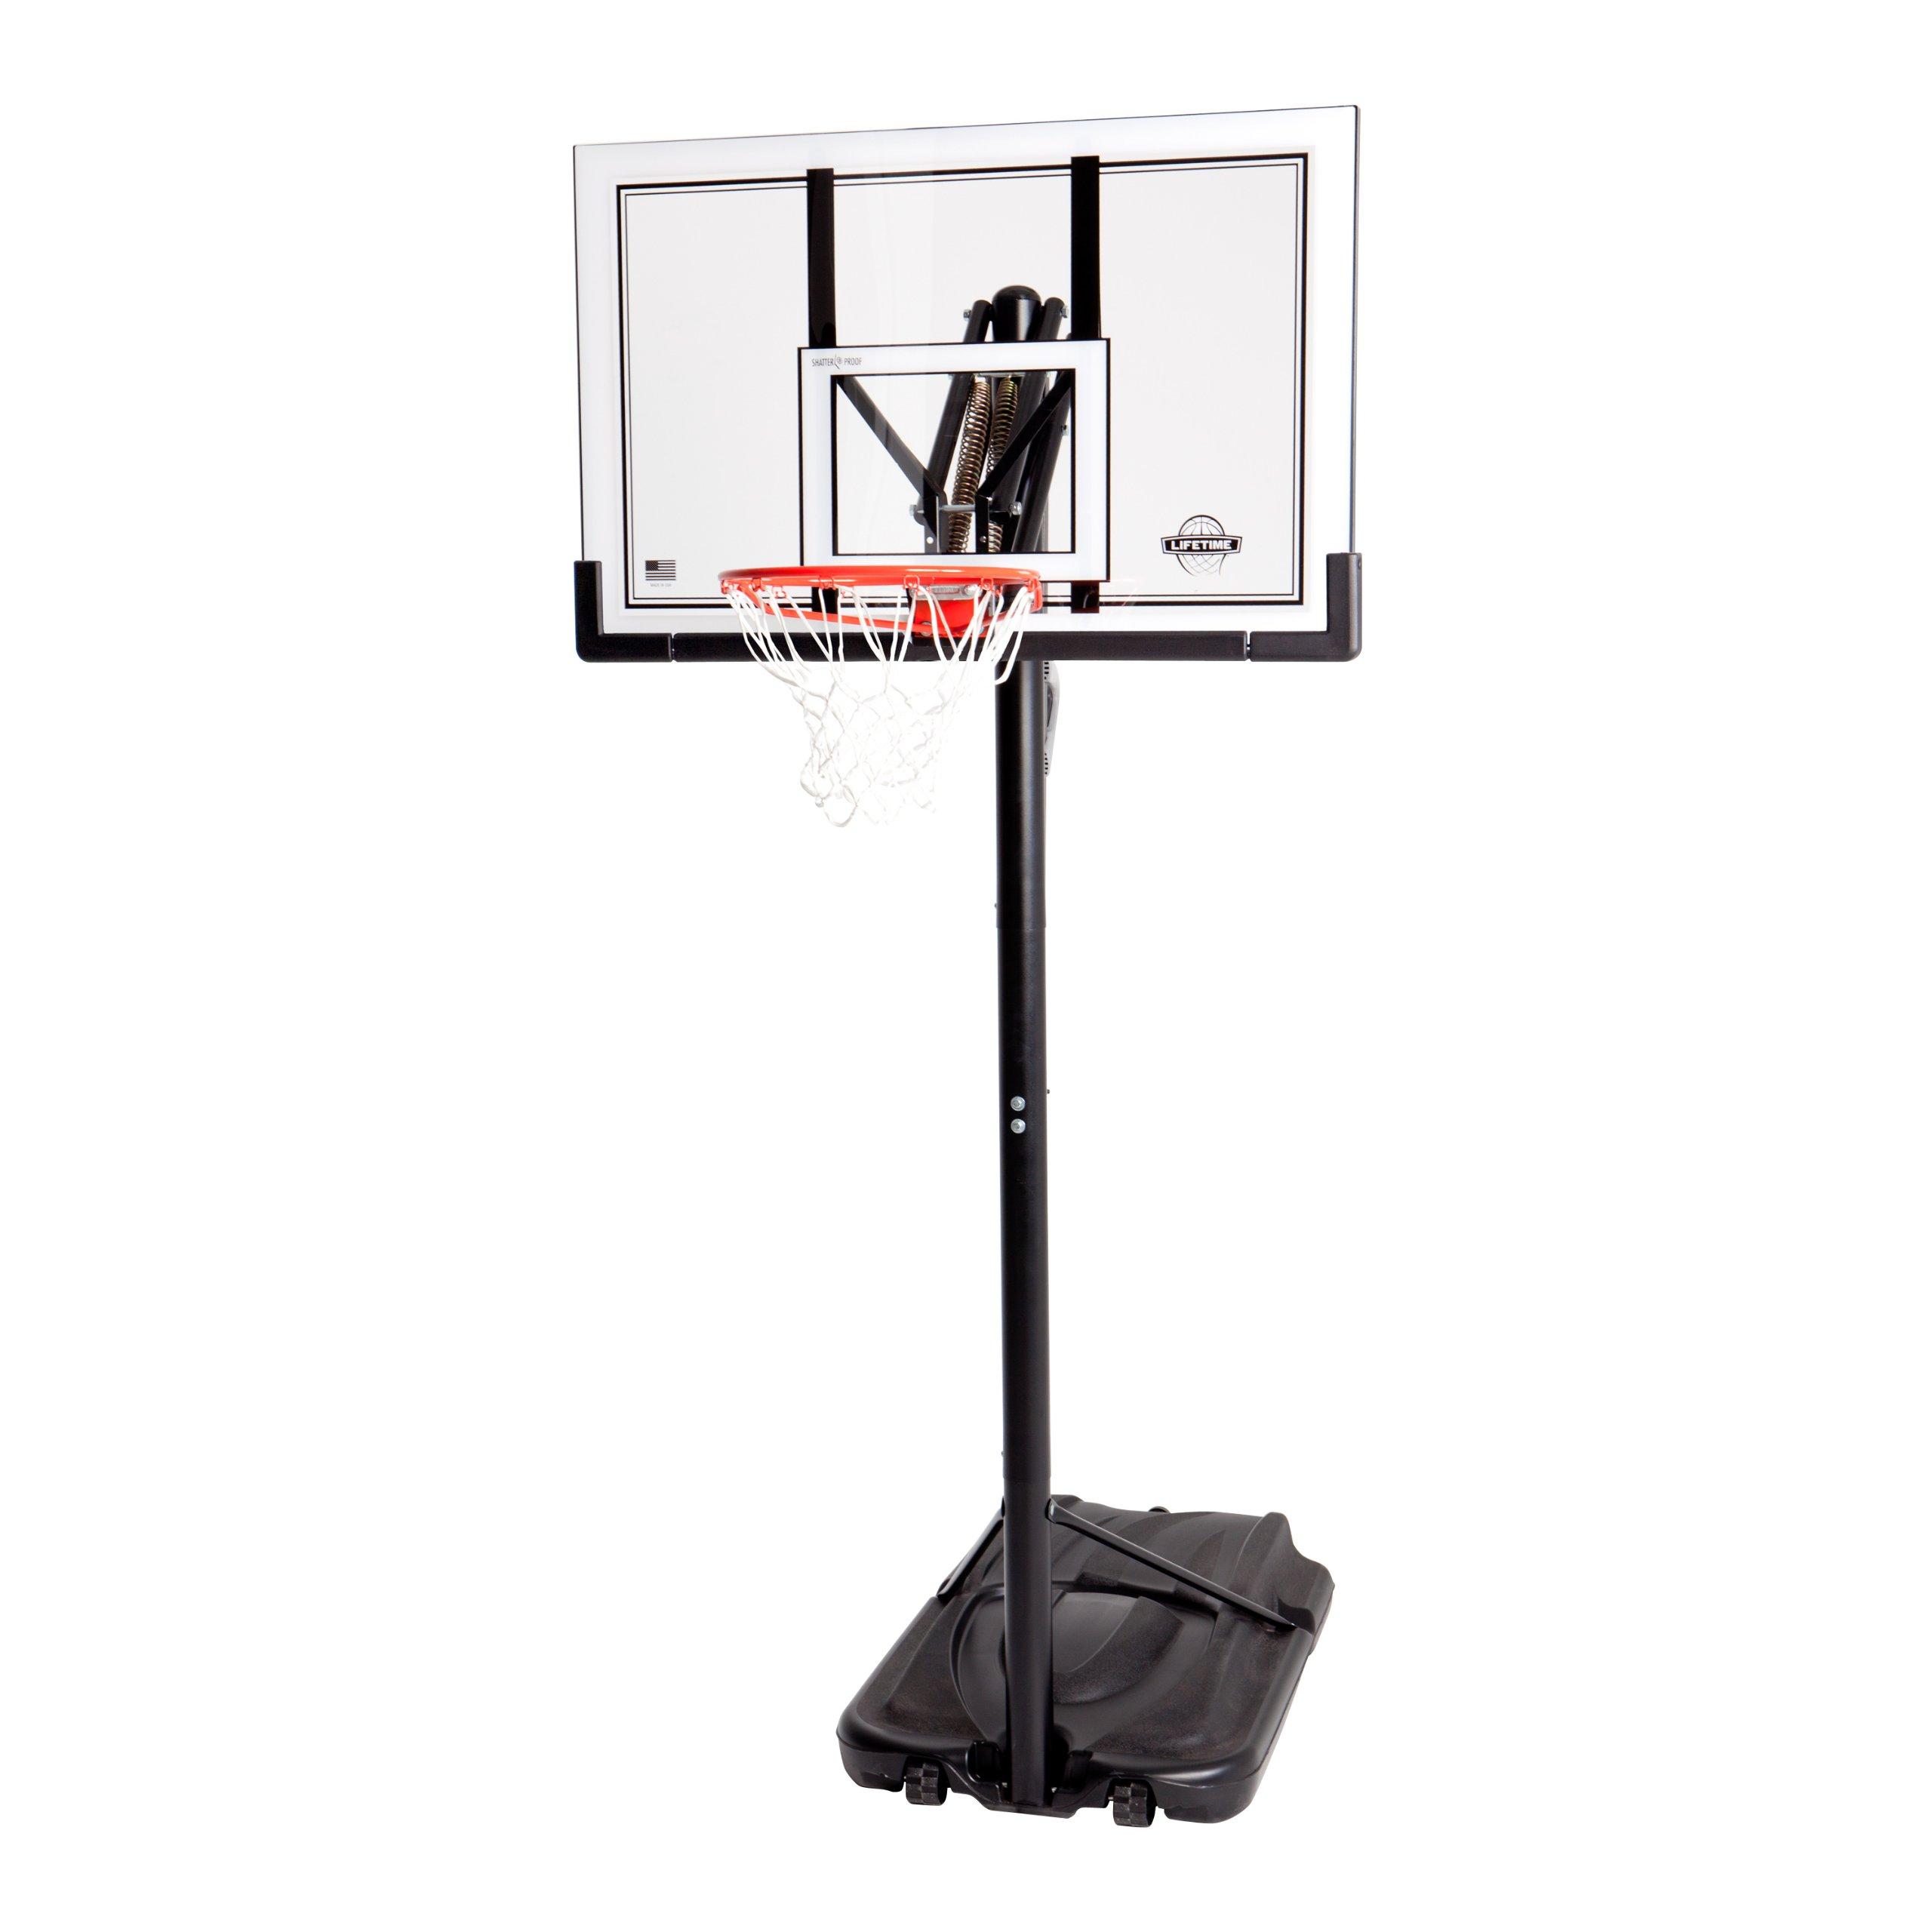 Lifetime 90176 Portable Basketball System, 52 Inch Shatterproof Backboard by Lifetime